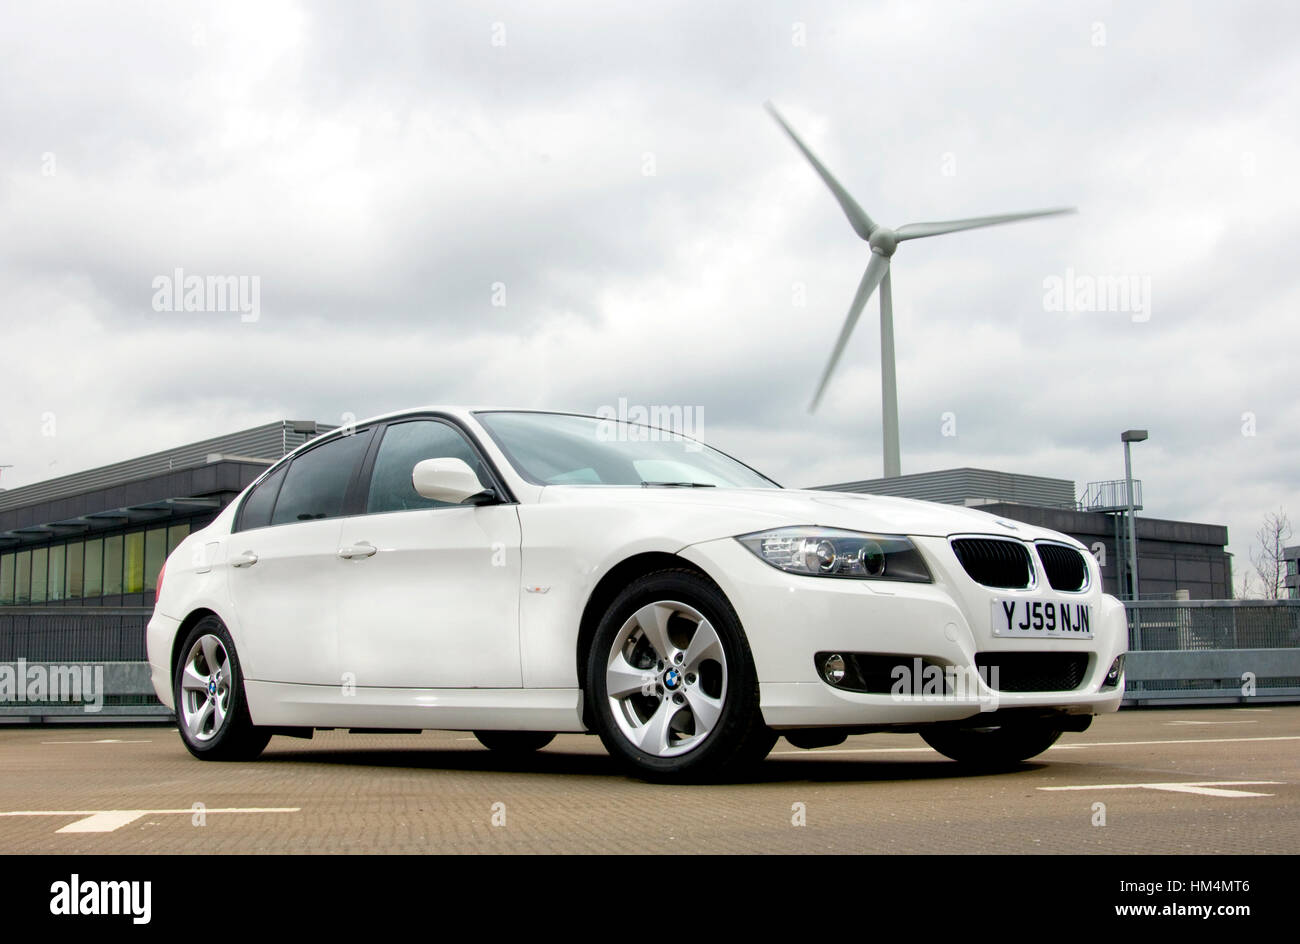 2010 BMW 320d Efficient Dynamics high MPG diesel premium saloon car - Stock Image